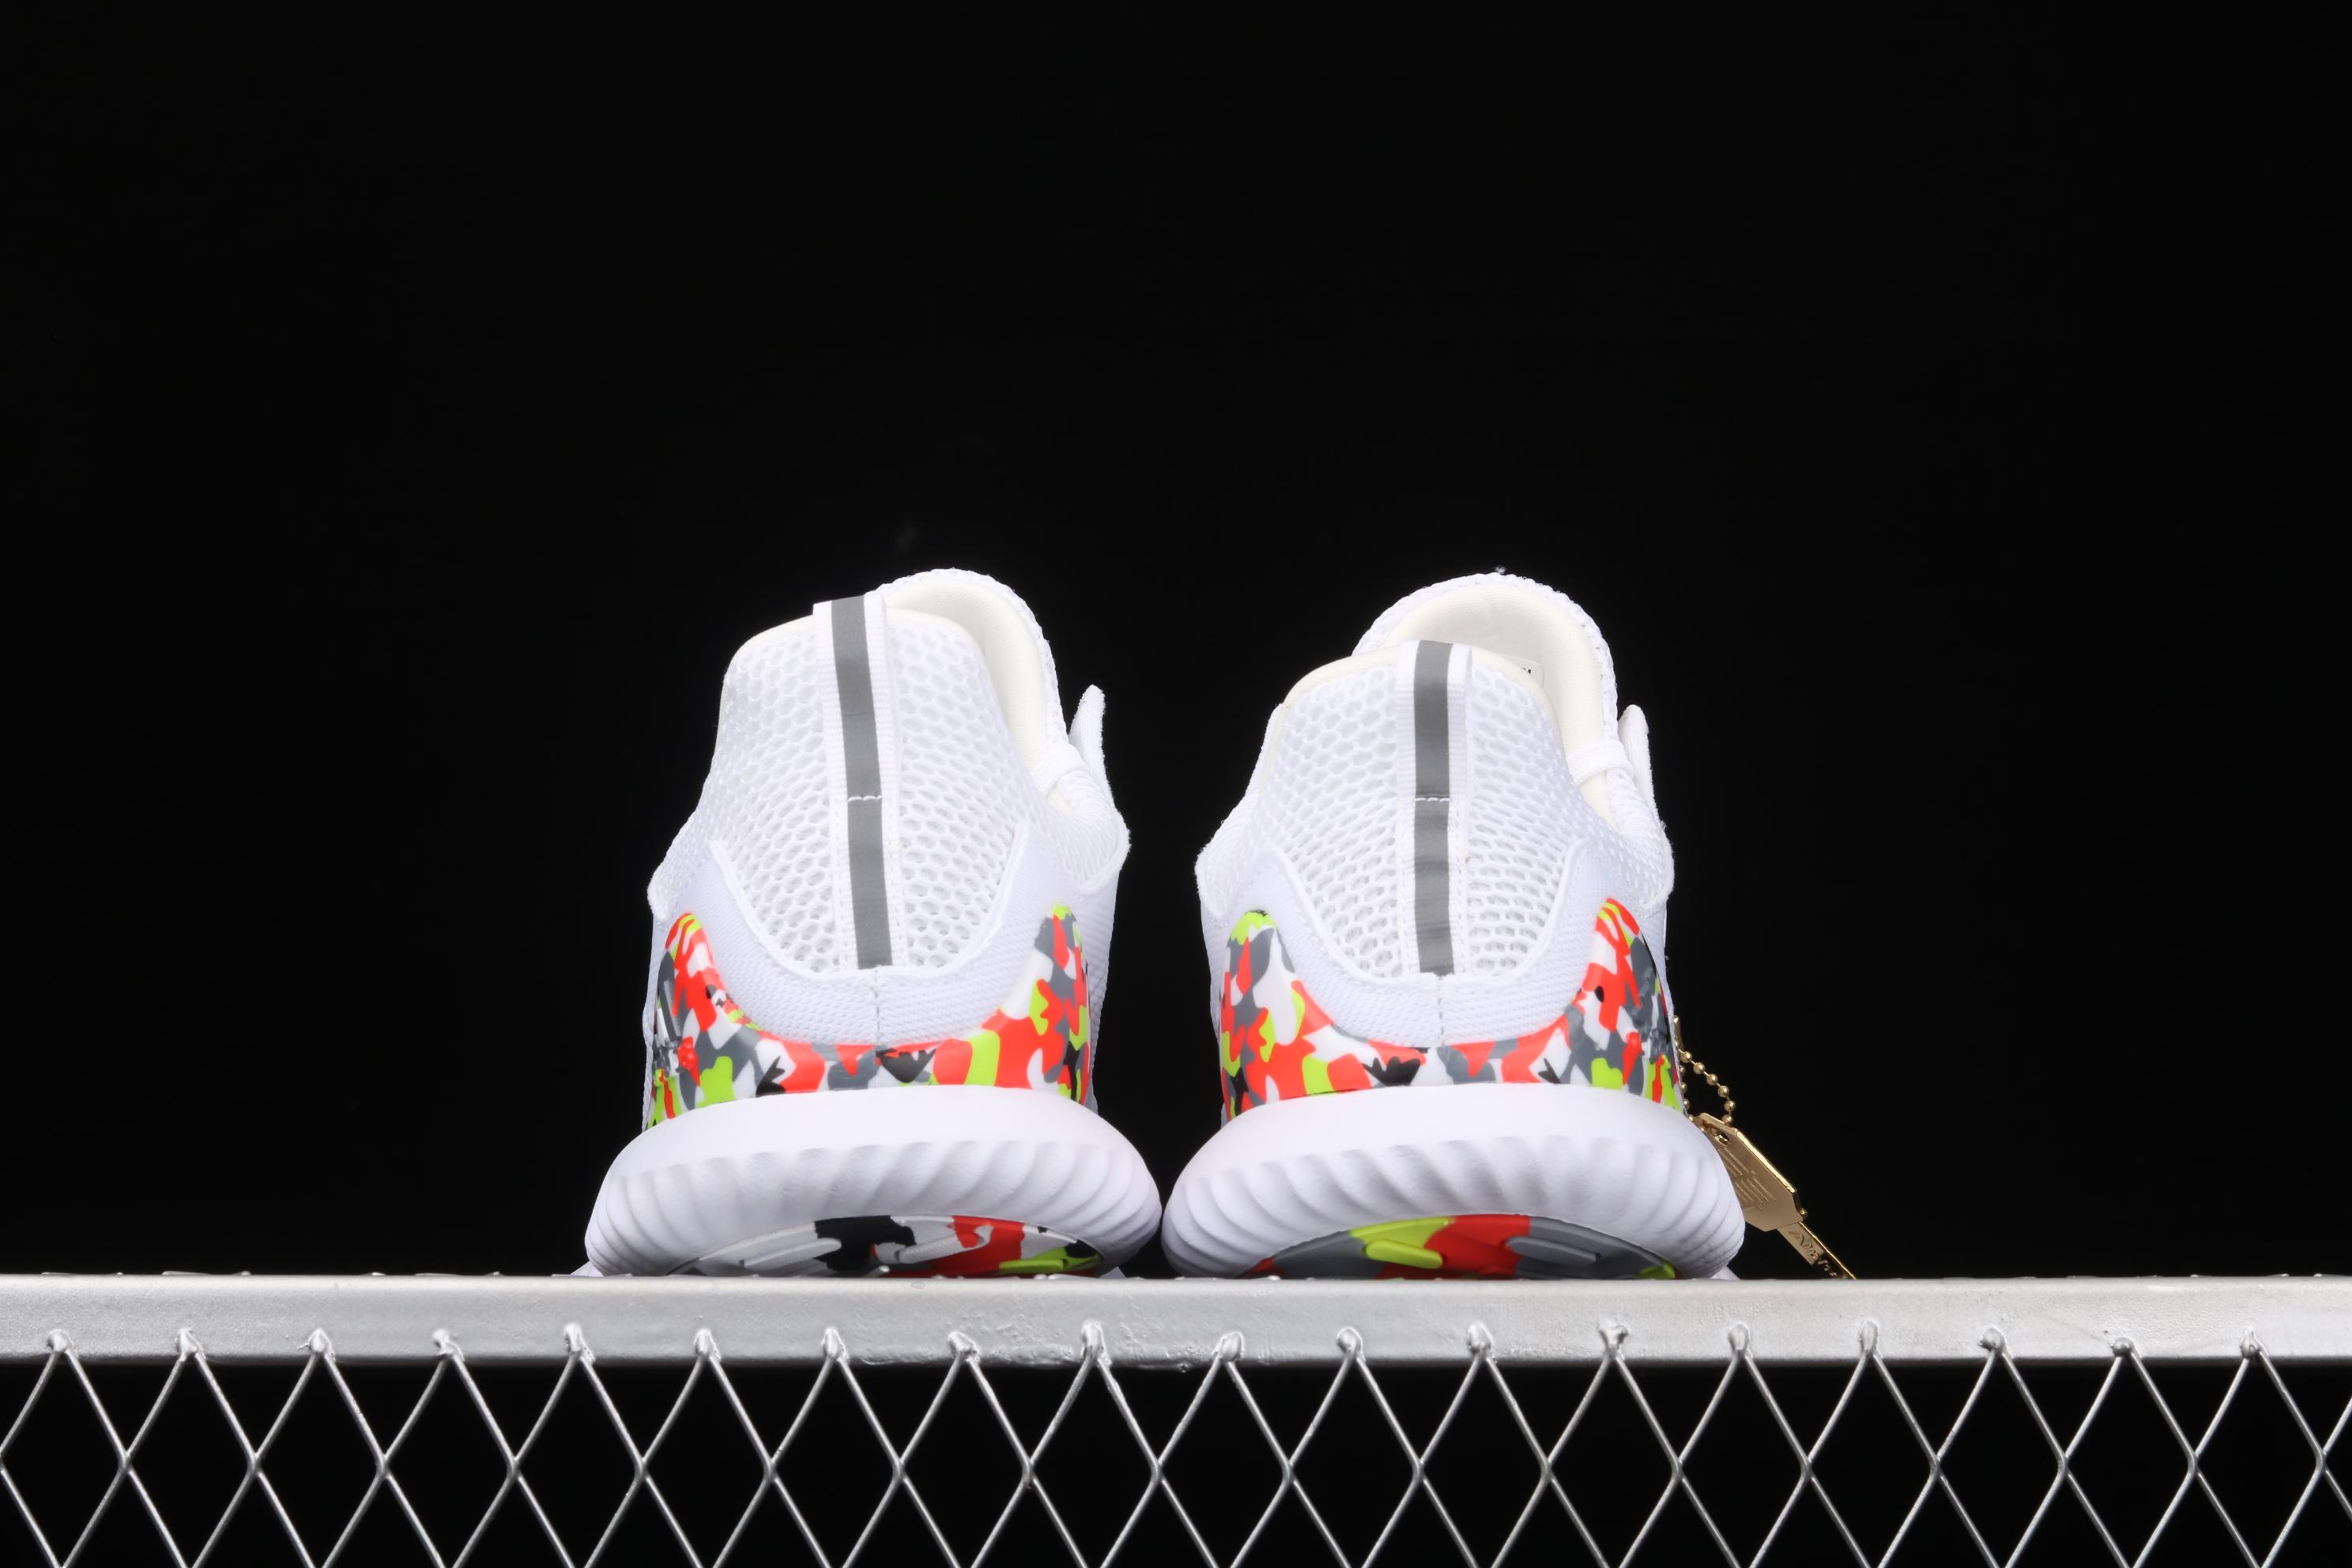 AlphaBounce Beyond M B89097 阿尔法网面休闲跑步鞋